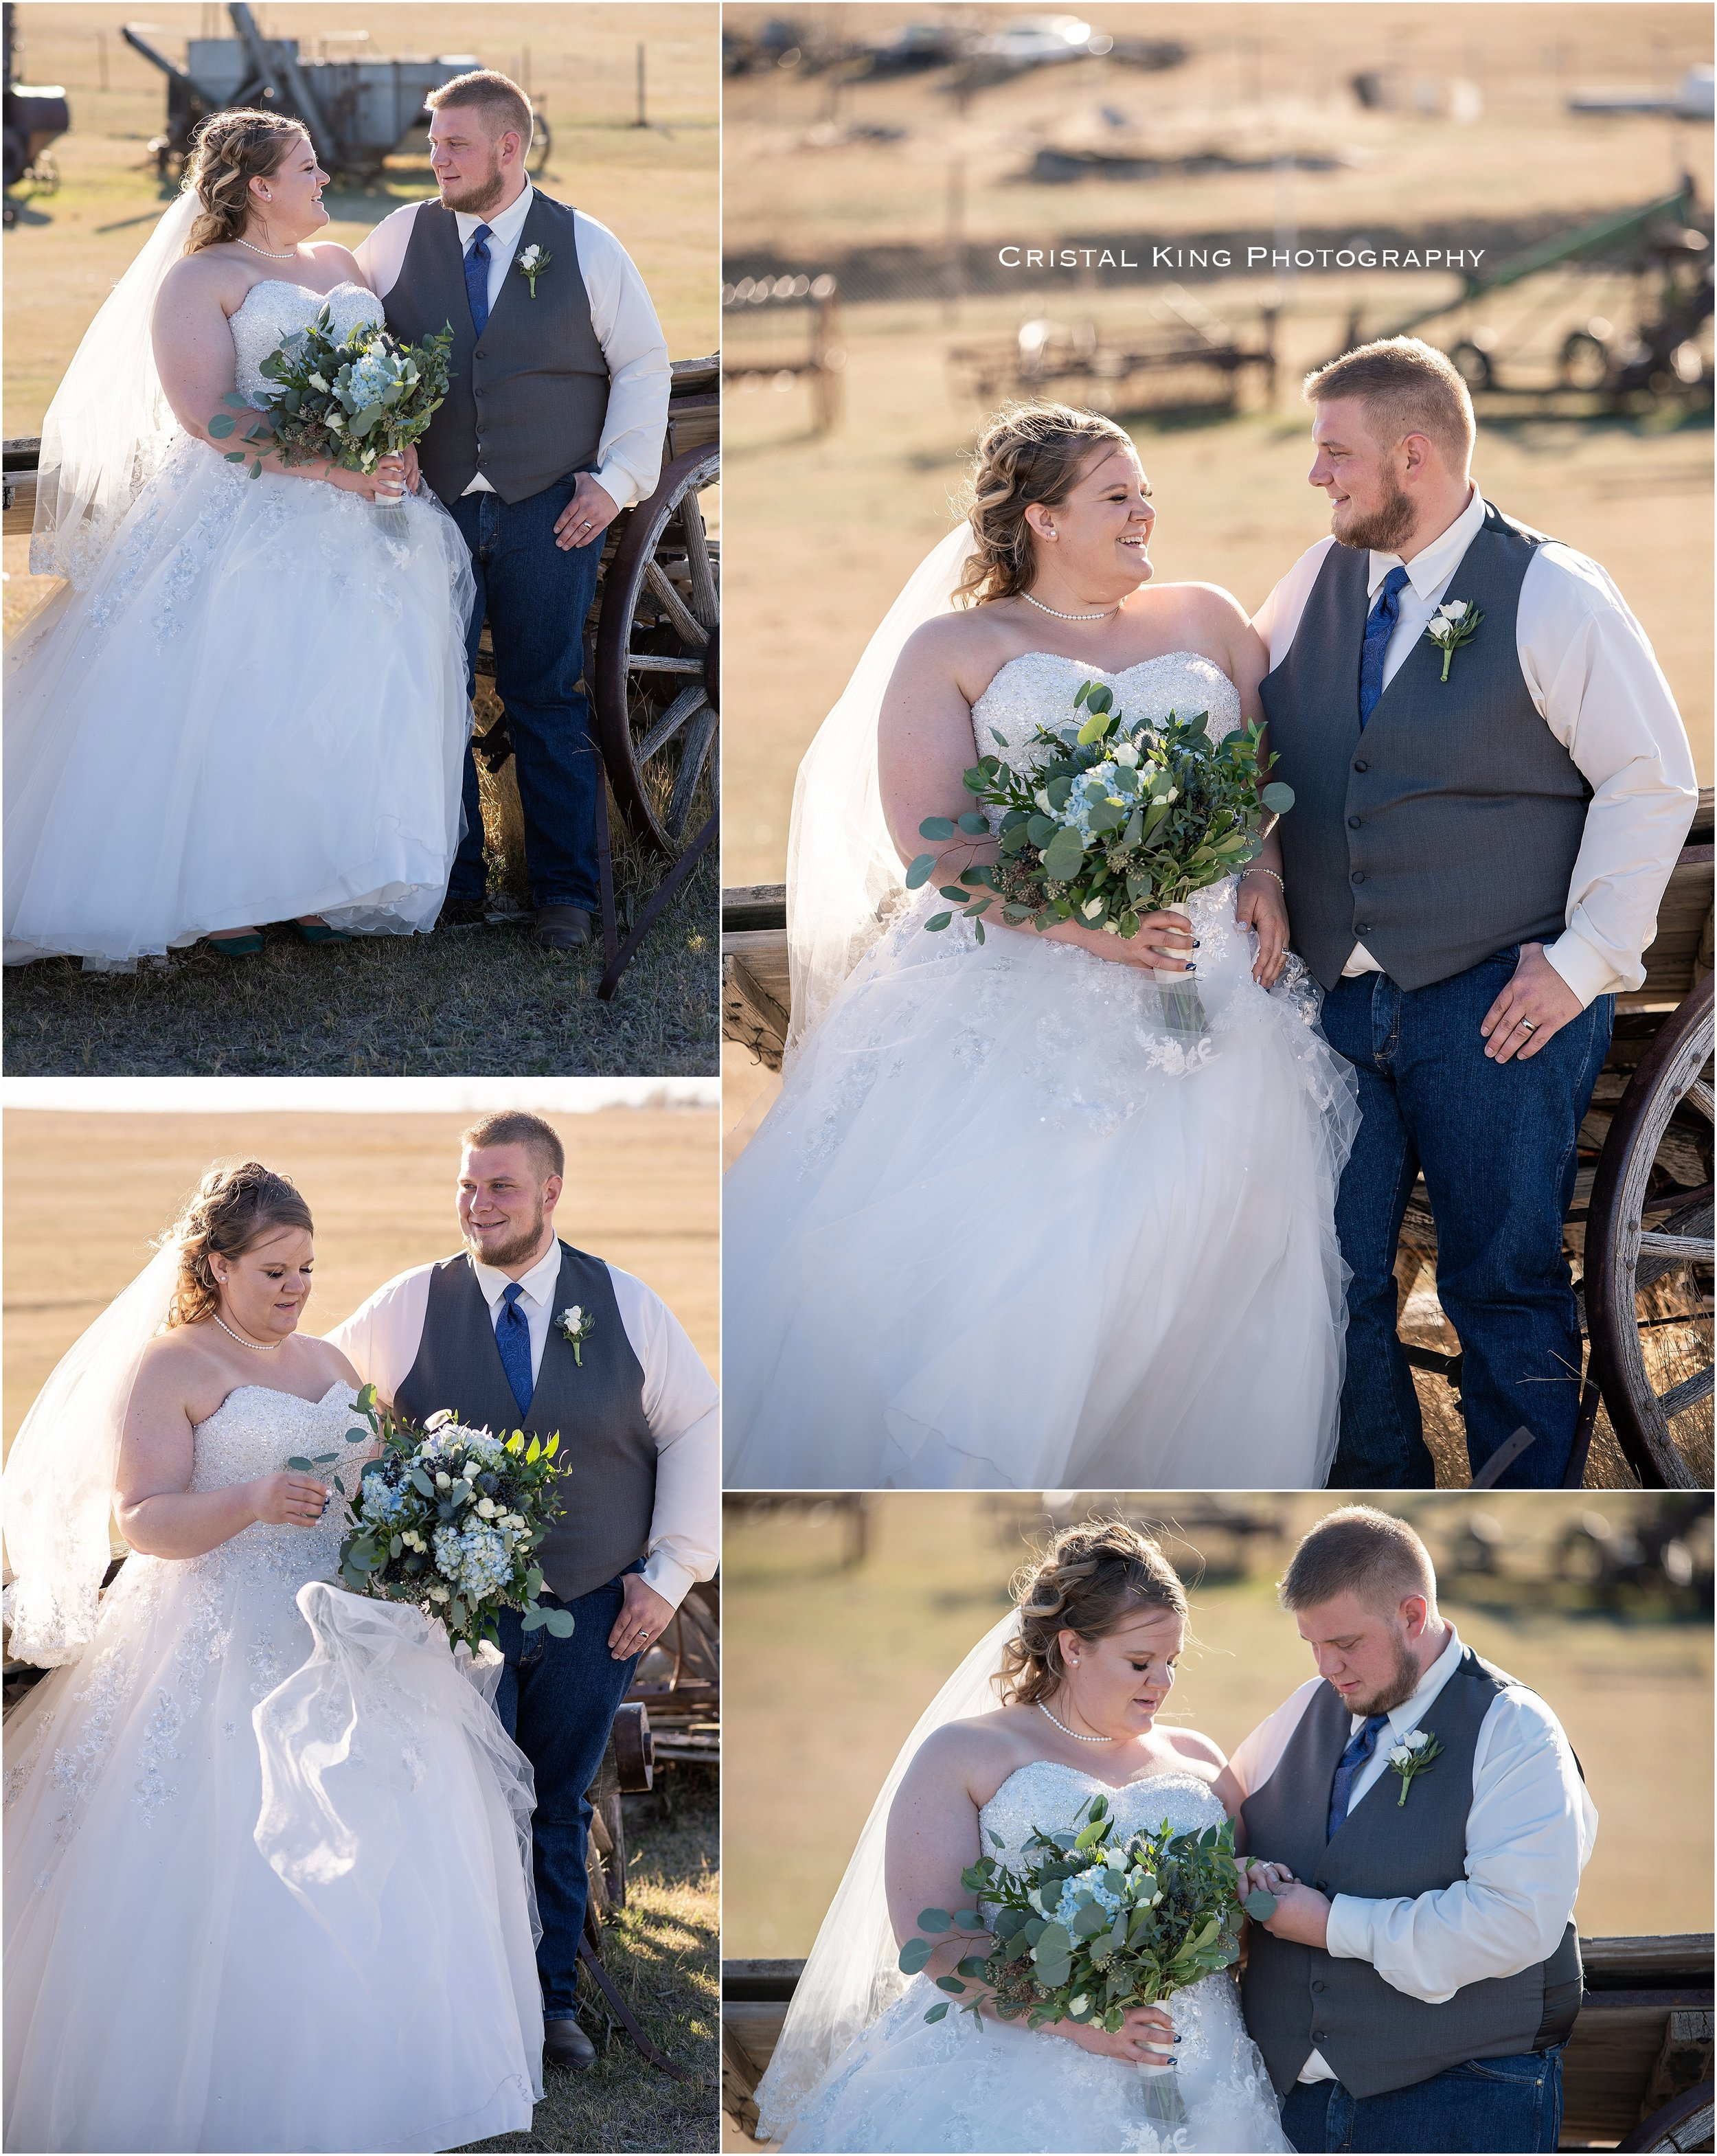 Tracy-Kyles-Wedding-113.jpg